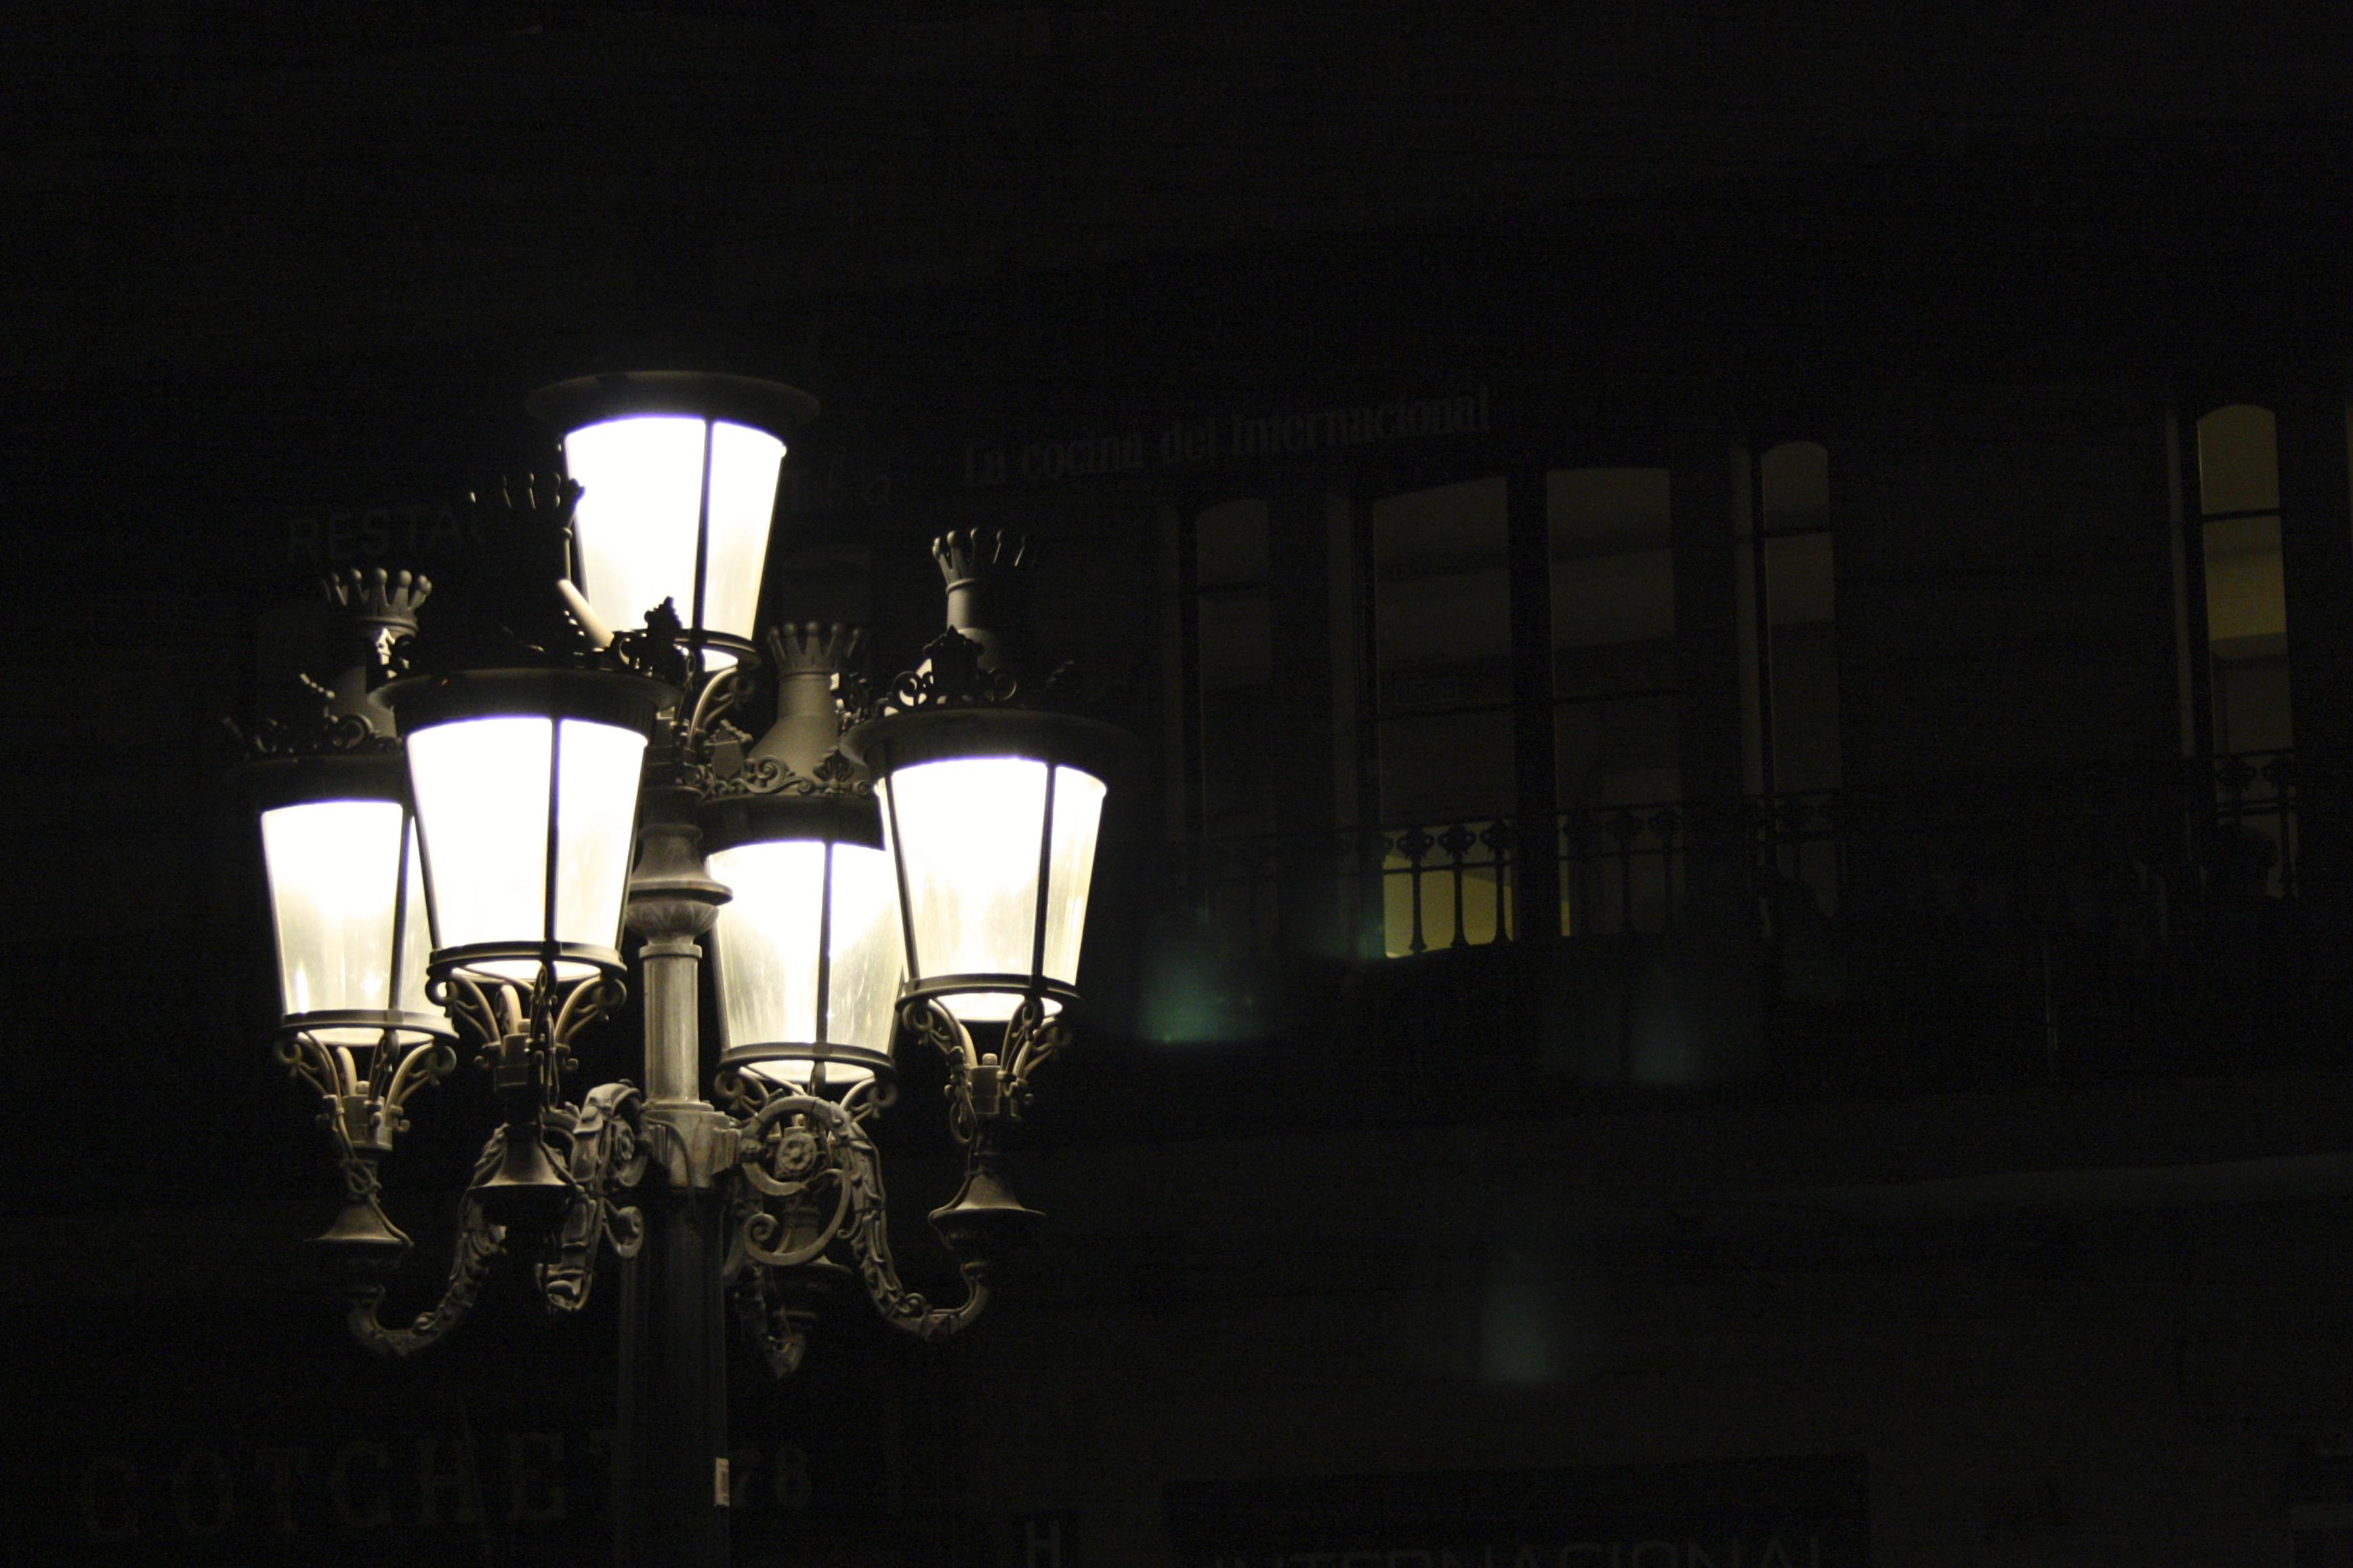 Light Night Darkness Street Light Black Monochrome Lighting Blackandwhite Publicdomain Blackbackground Streetlamp Decorative Light Fixture Public Domain